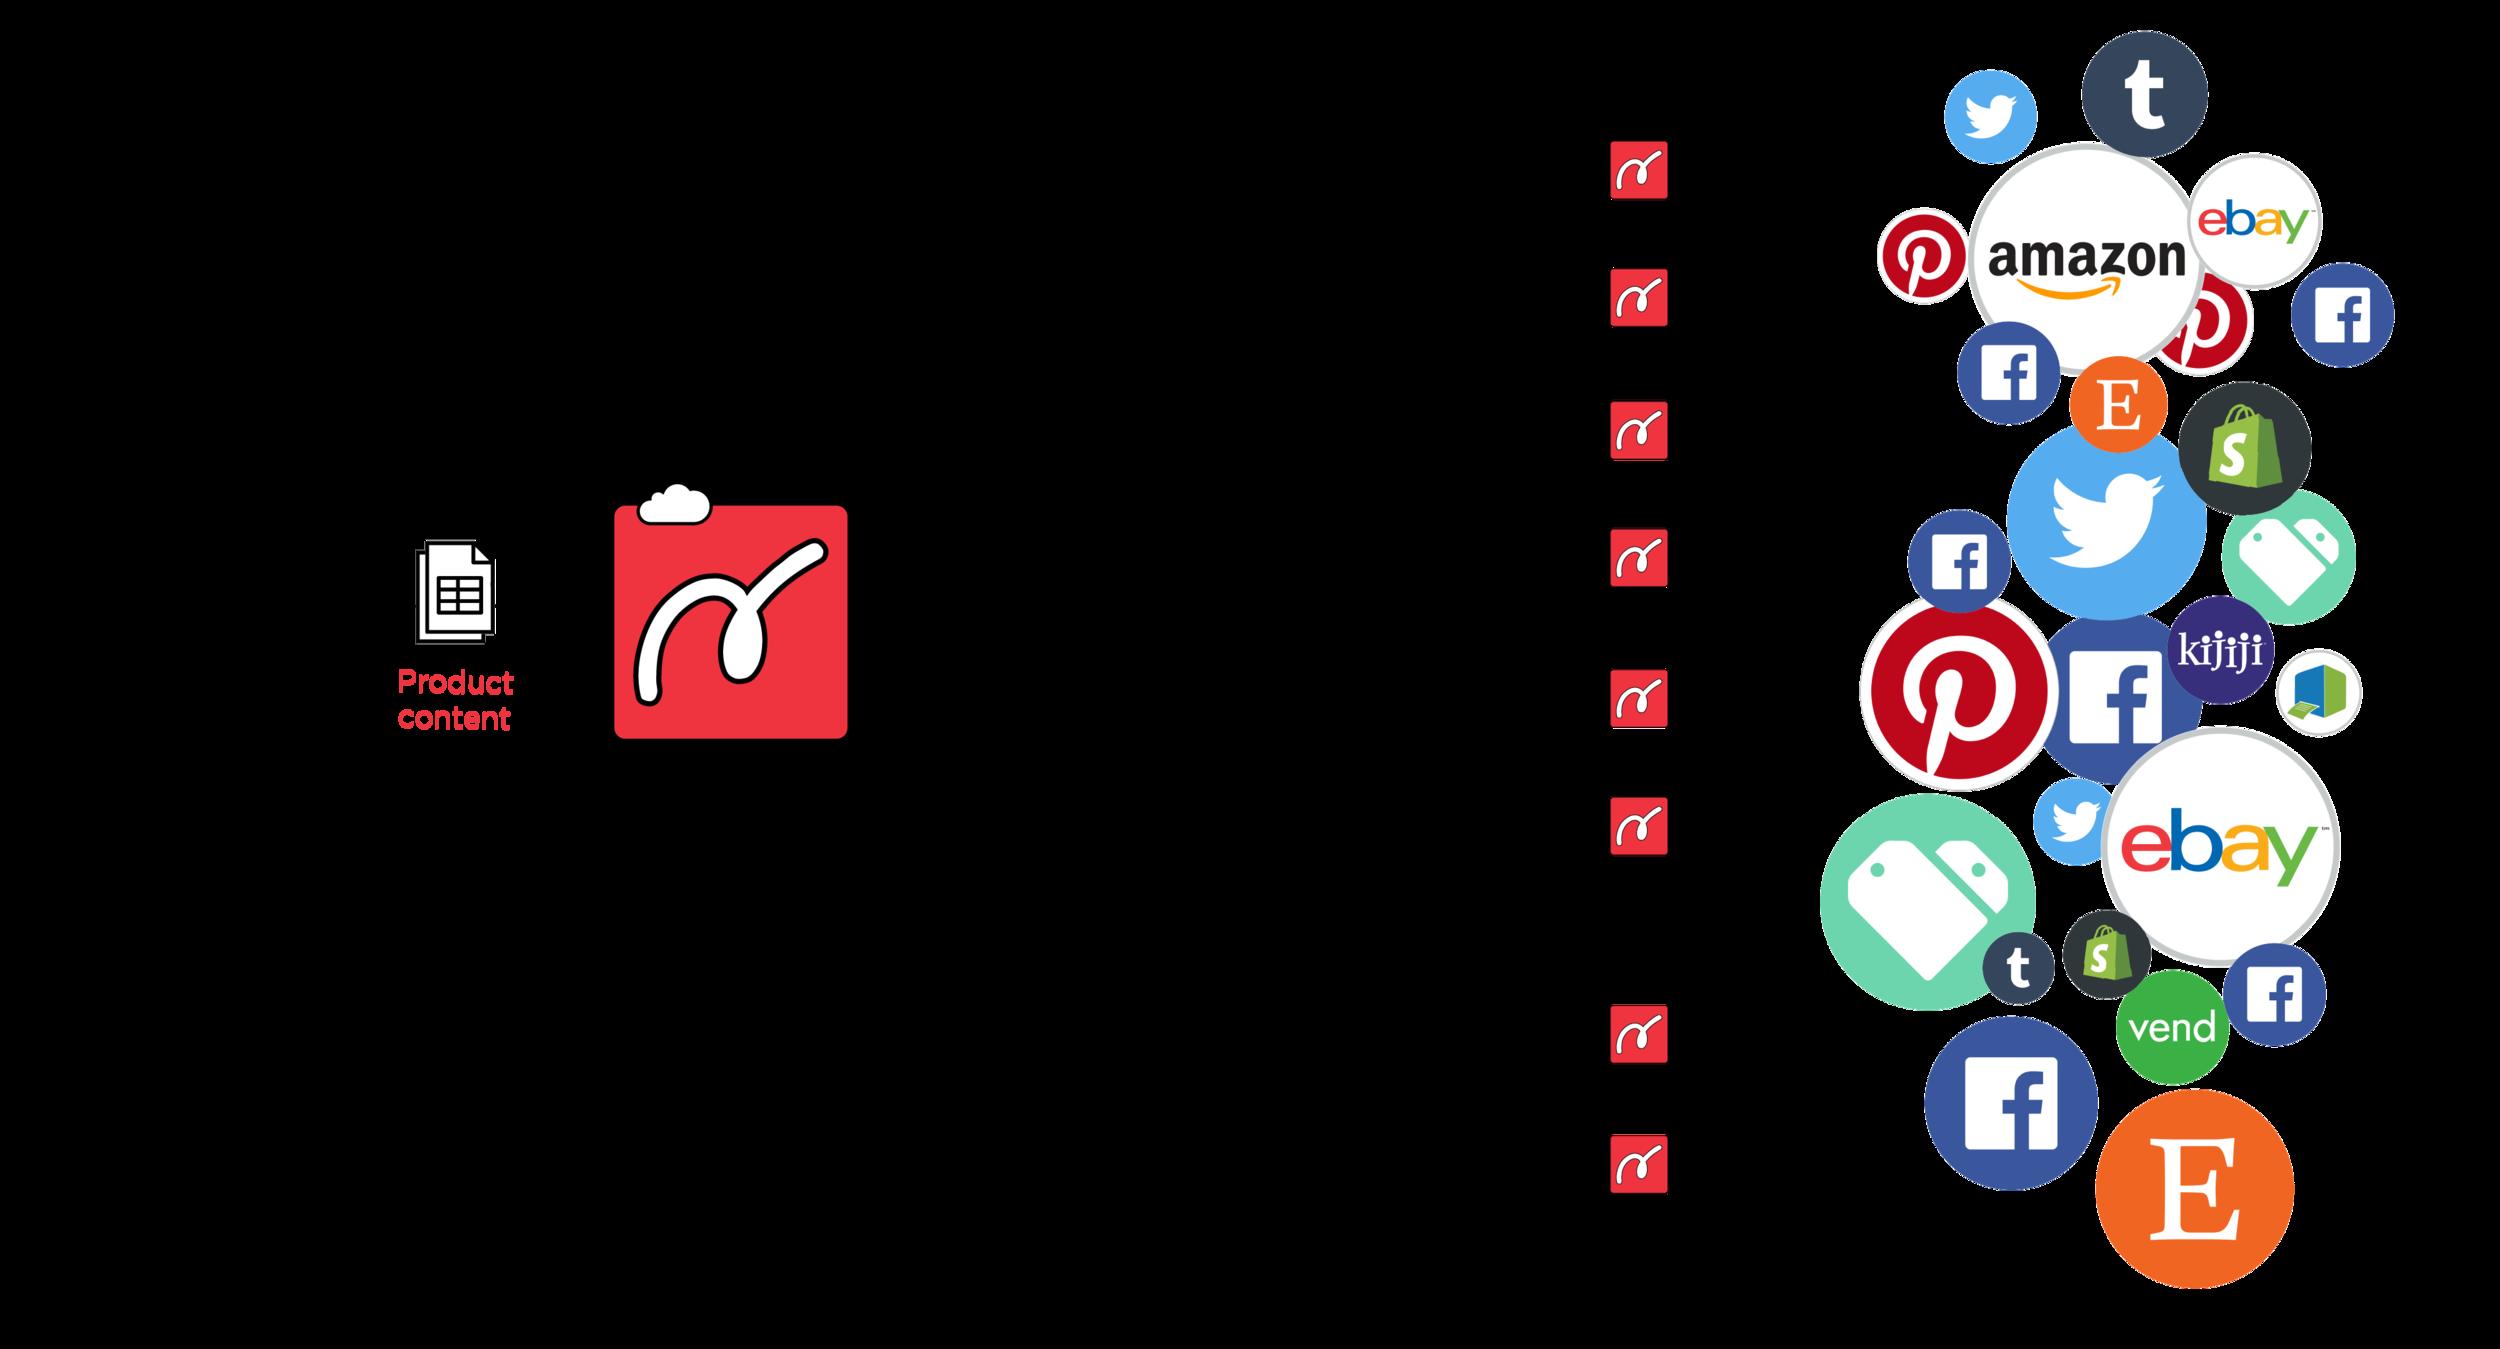 nembol-product-upload-brands.png